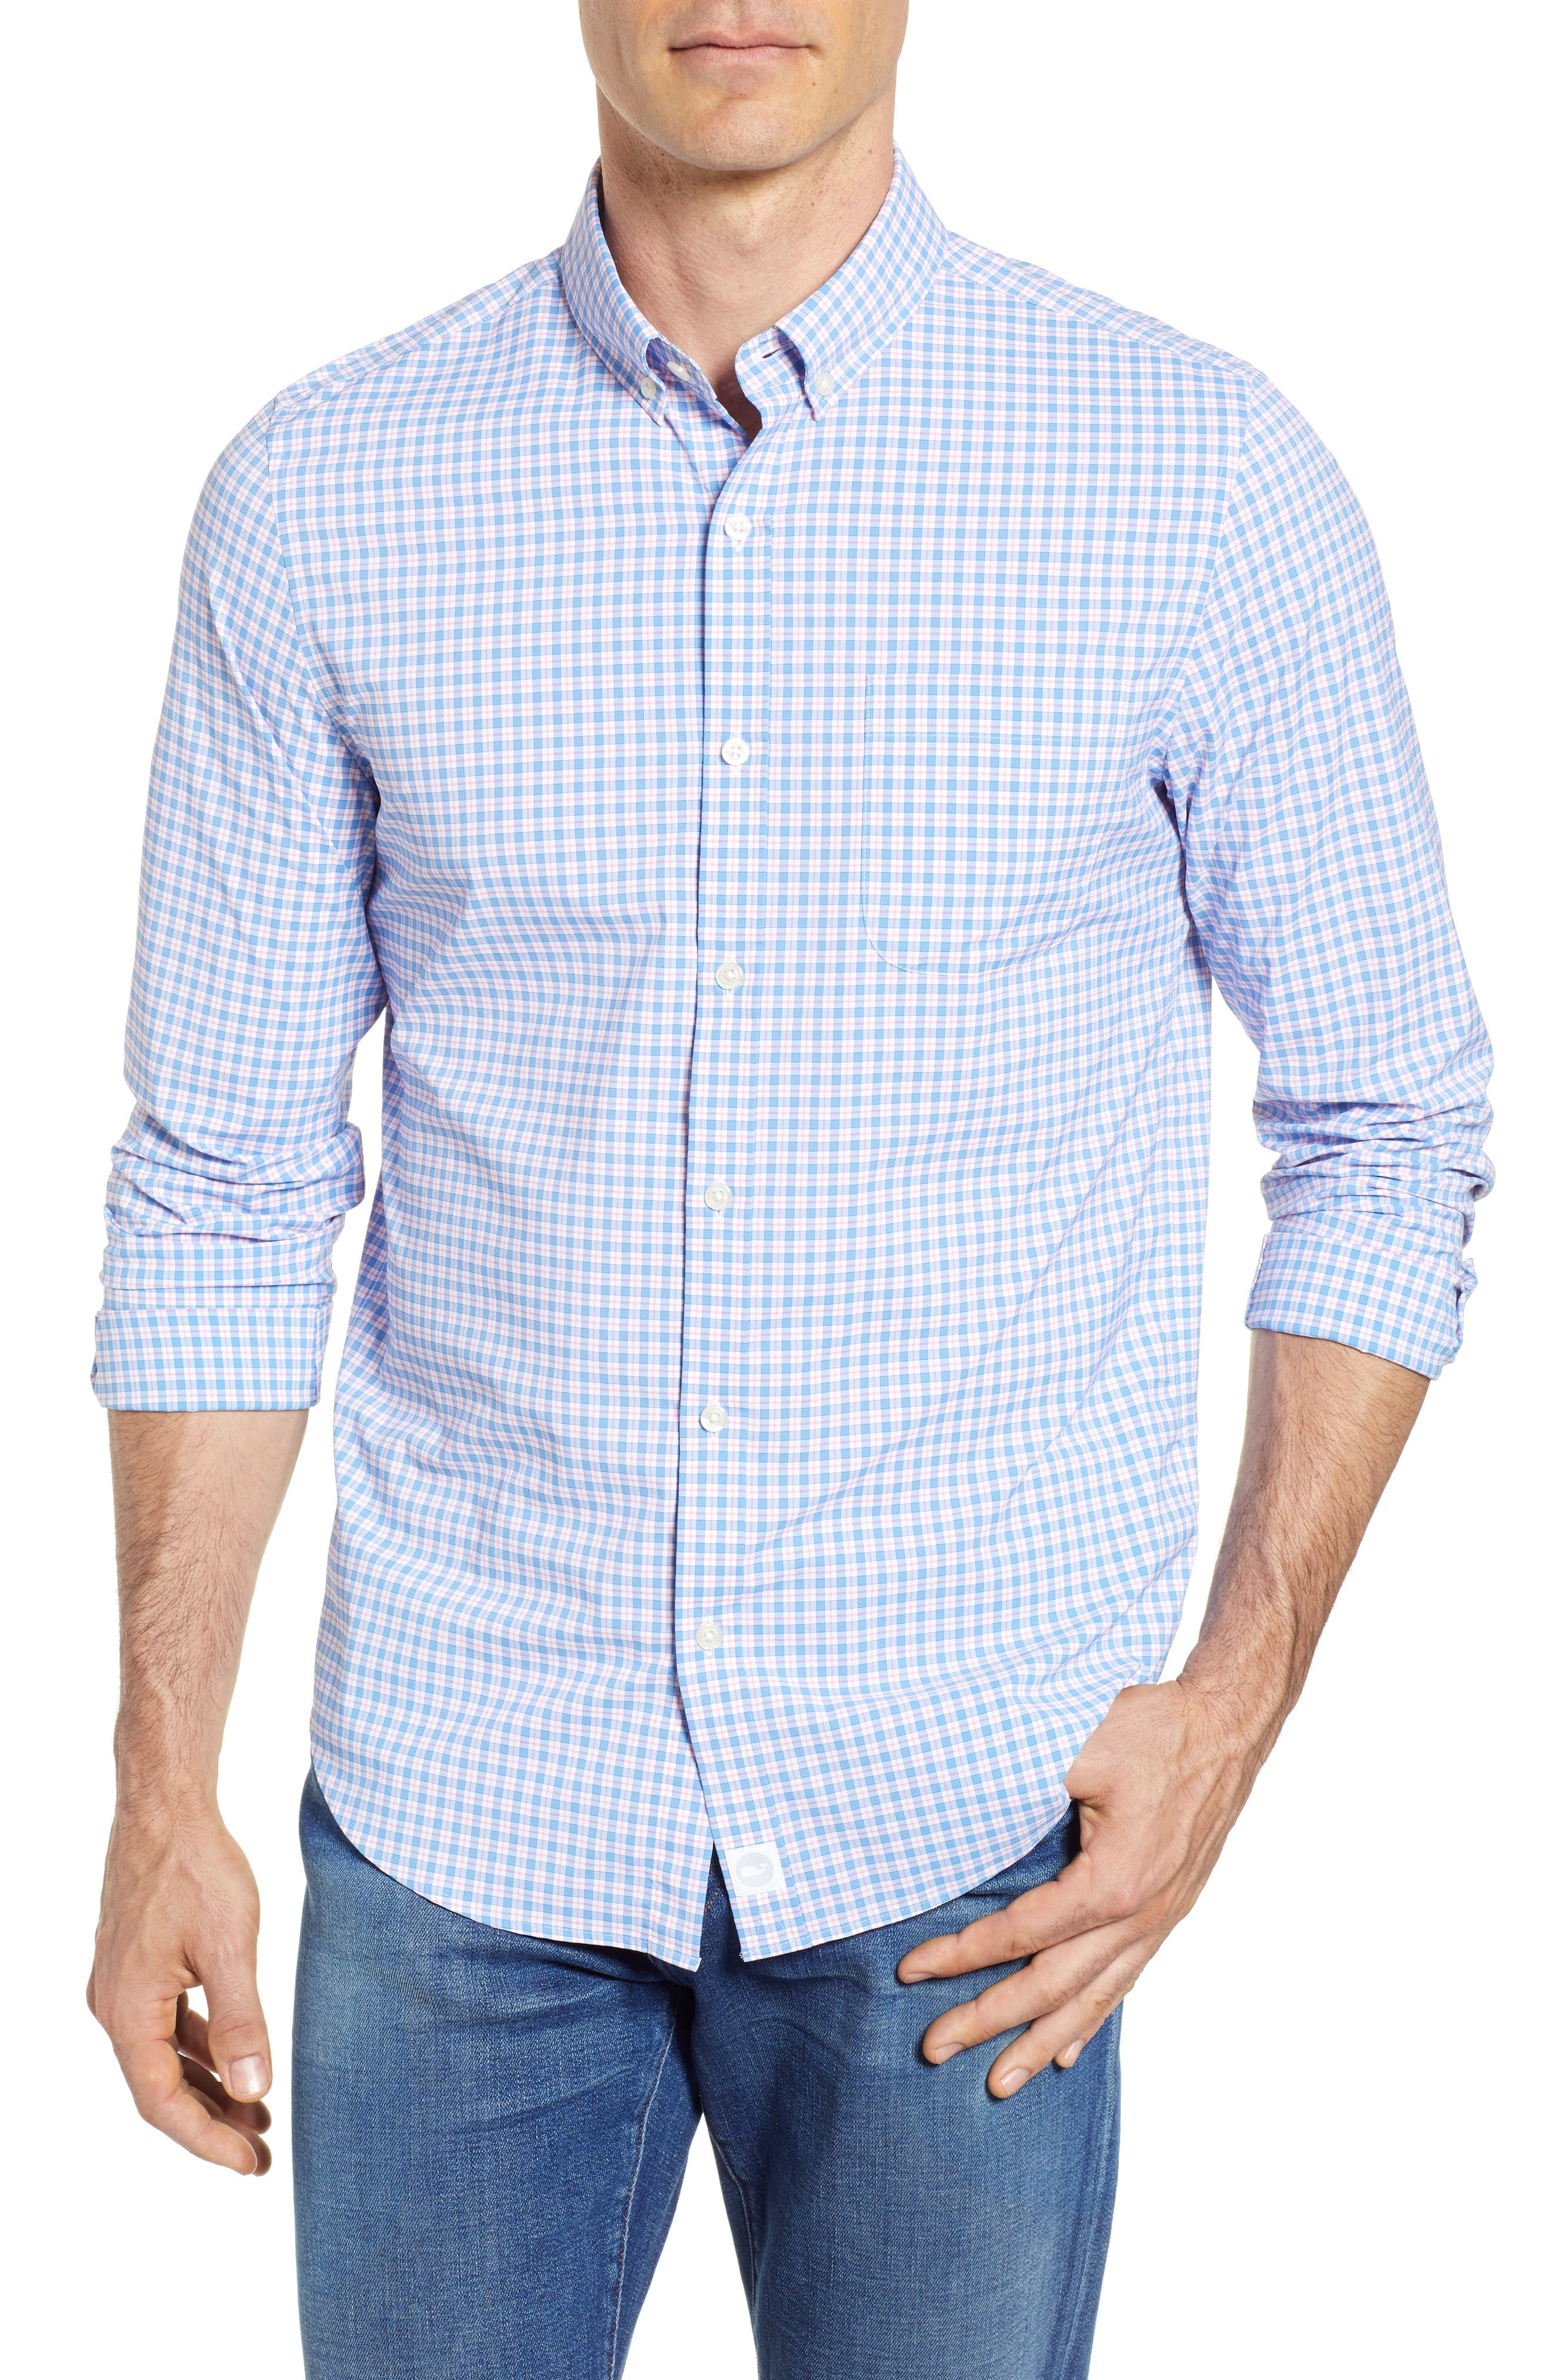 Oyster Pond Slim Fit Plaid Sport Shirt,                             Main thumbnail 1, color,                             OCEAN BREEZE